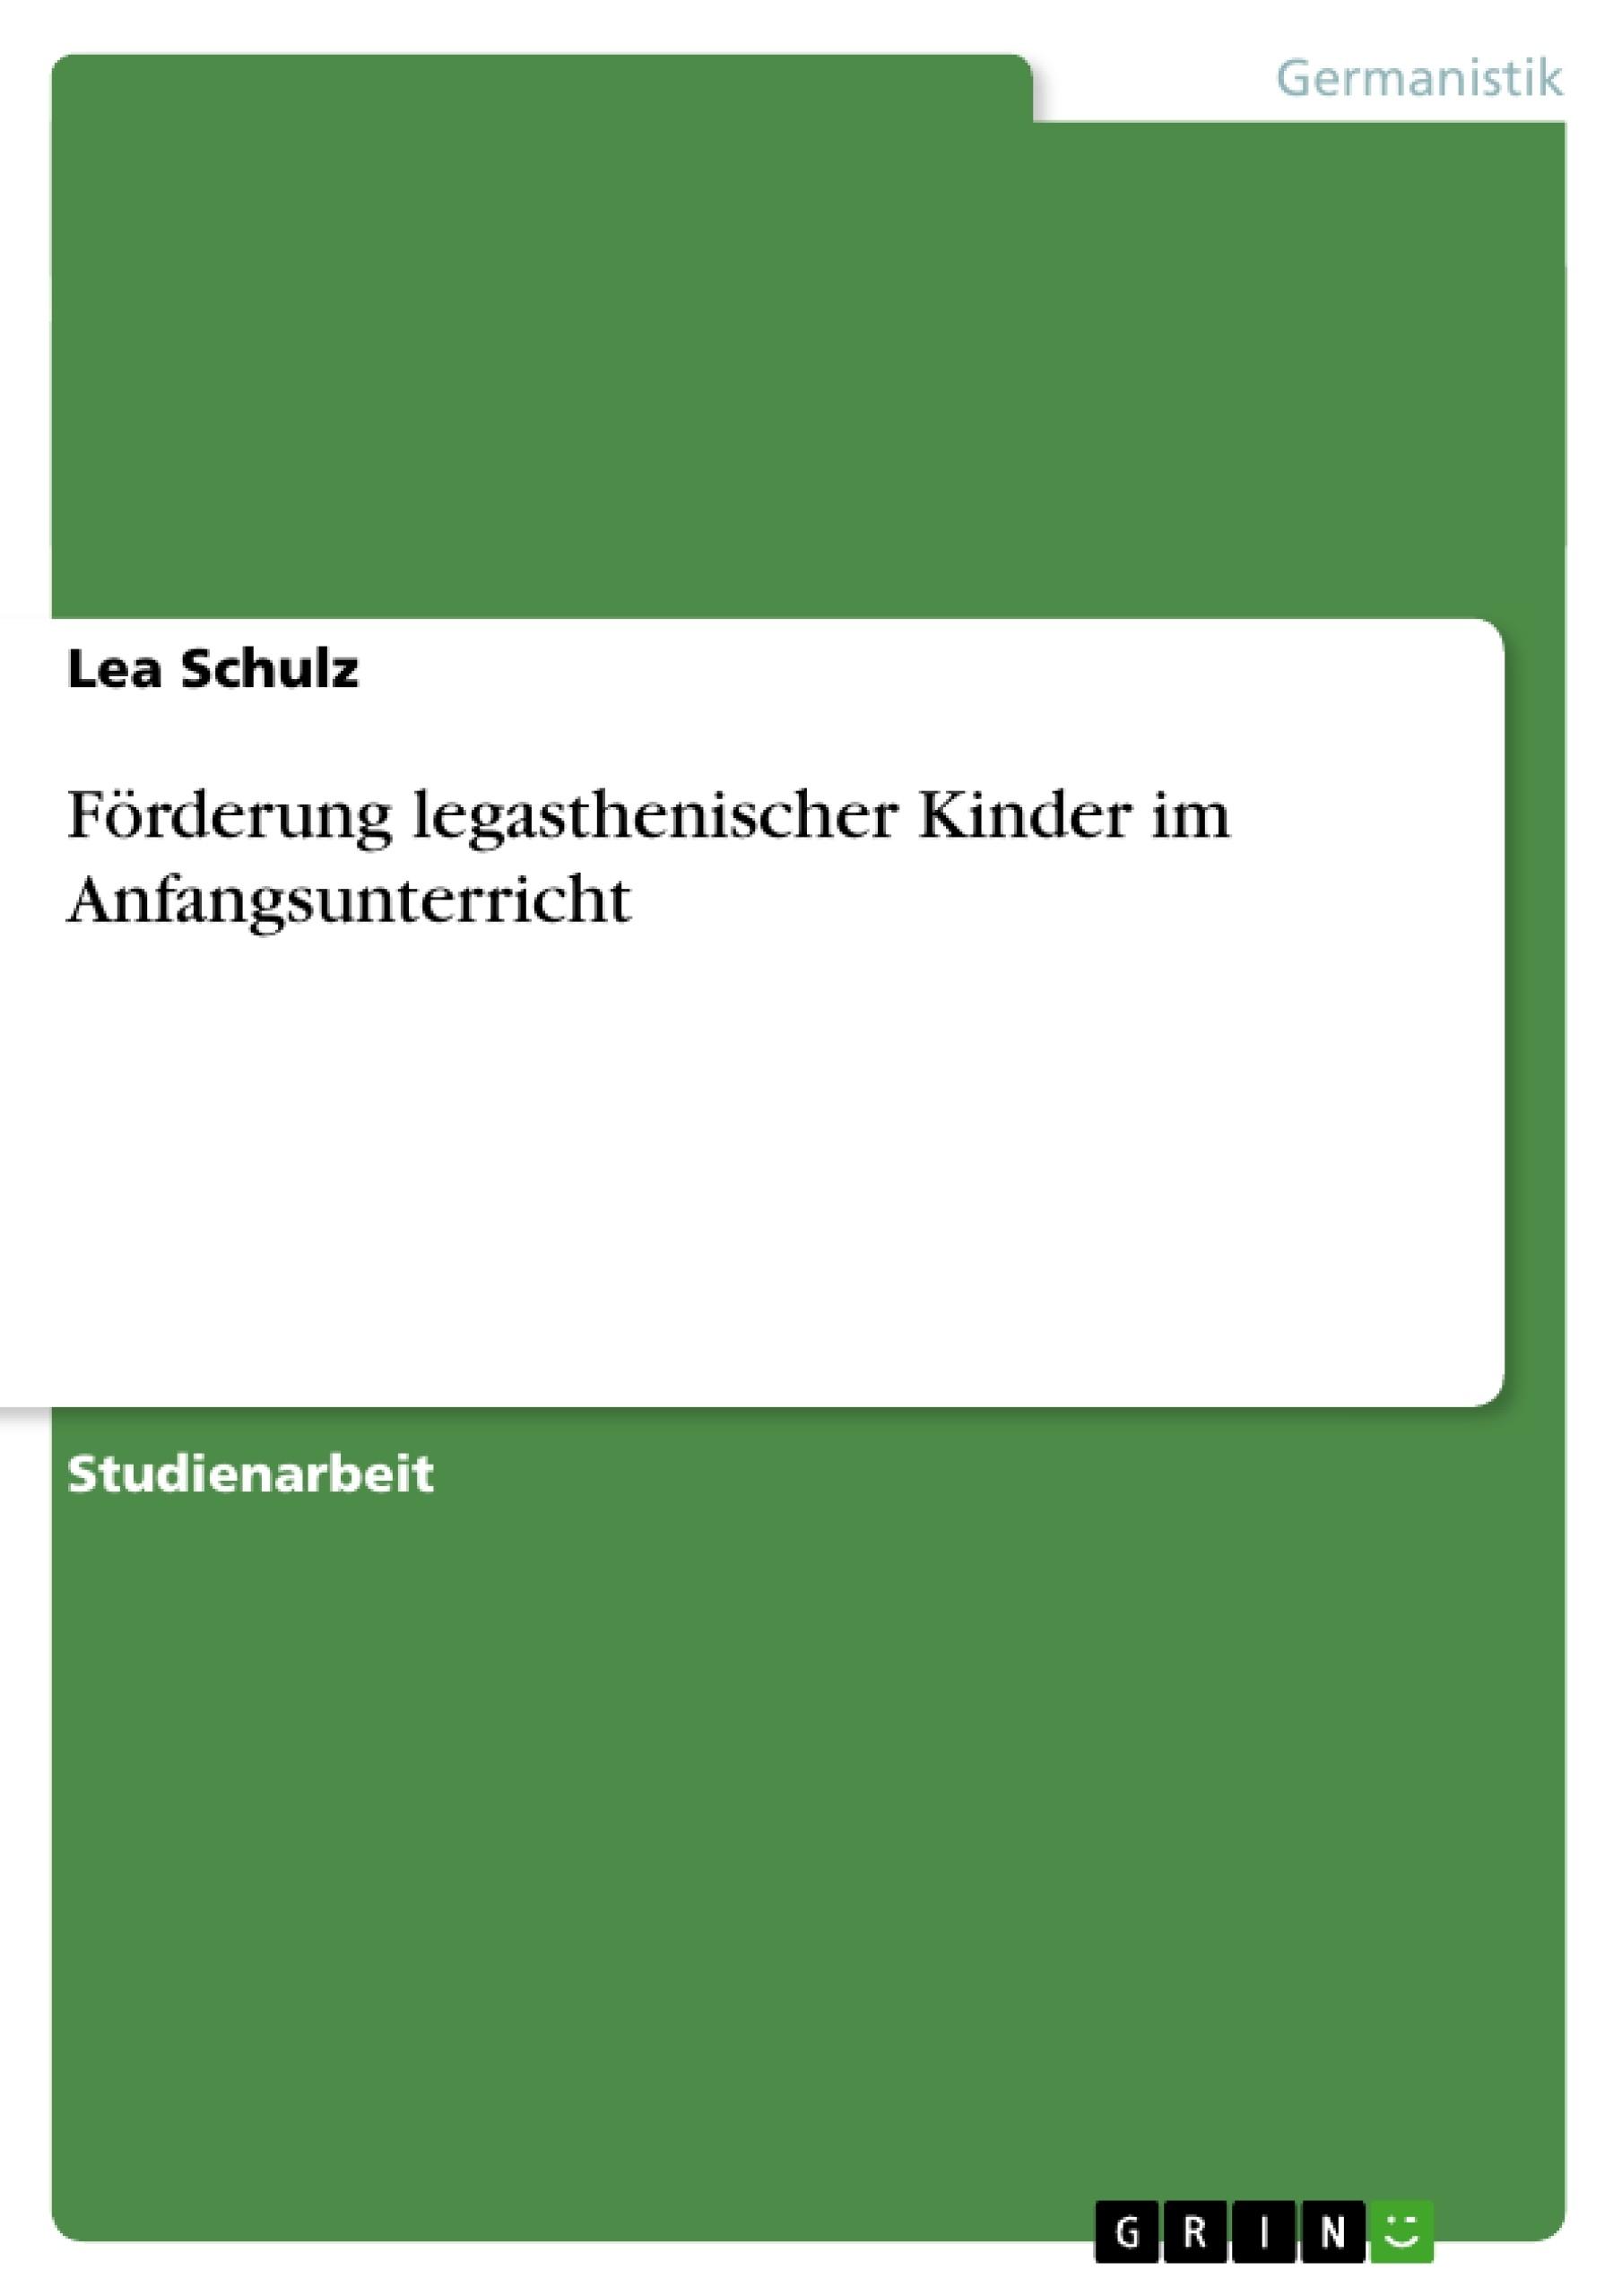 Titel: Förderung legasthenischer Kinder im Anfangsunterricht